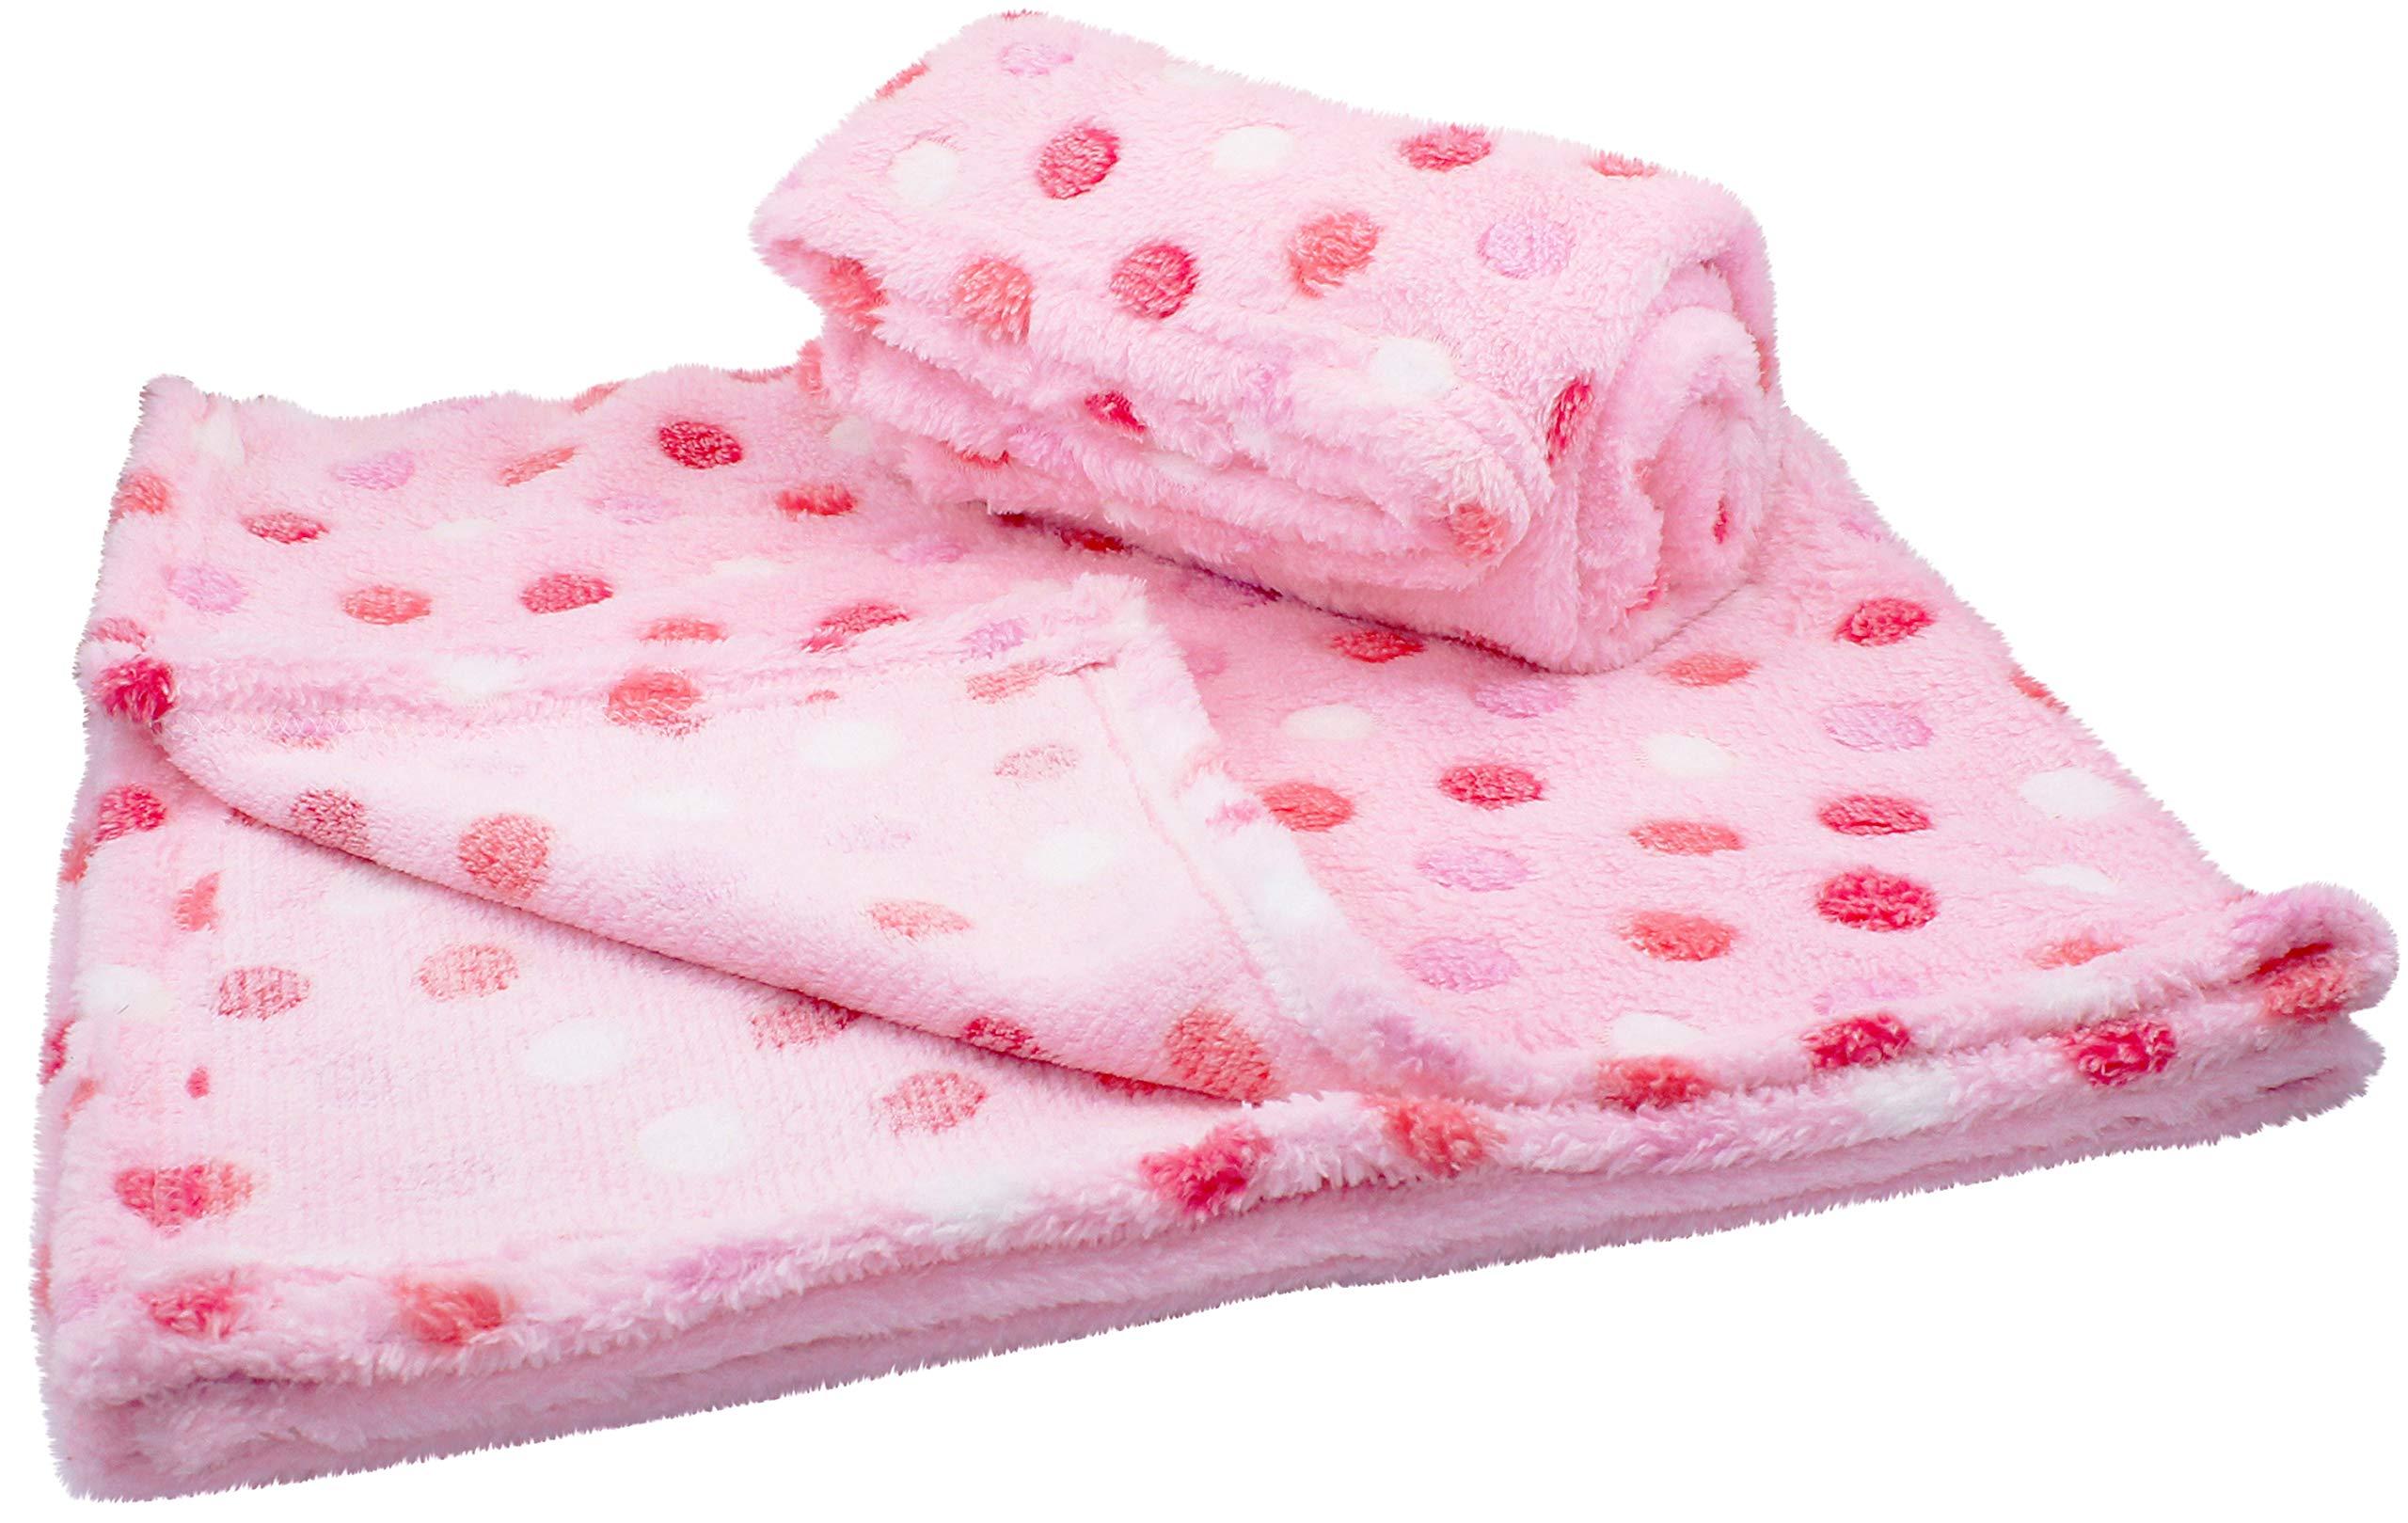 30x30 Inch Plush Fleece Girls Baby Blanket - Polka Dot Blankets by bogo Brands (Set of 2 - Pink)